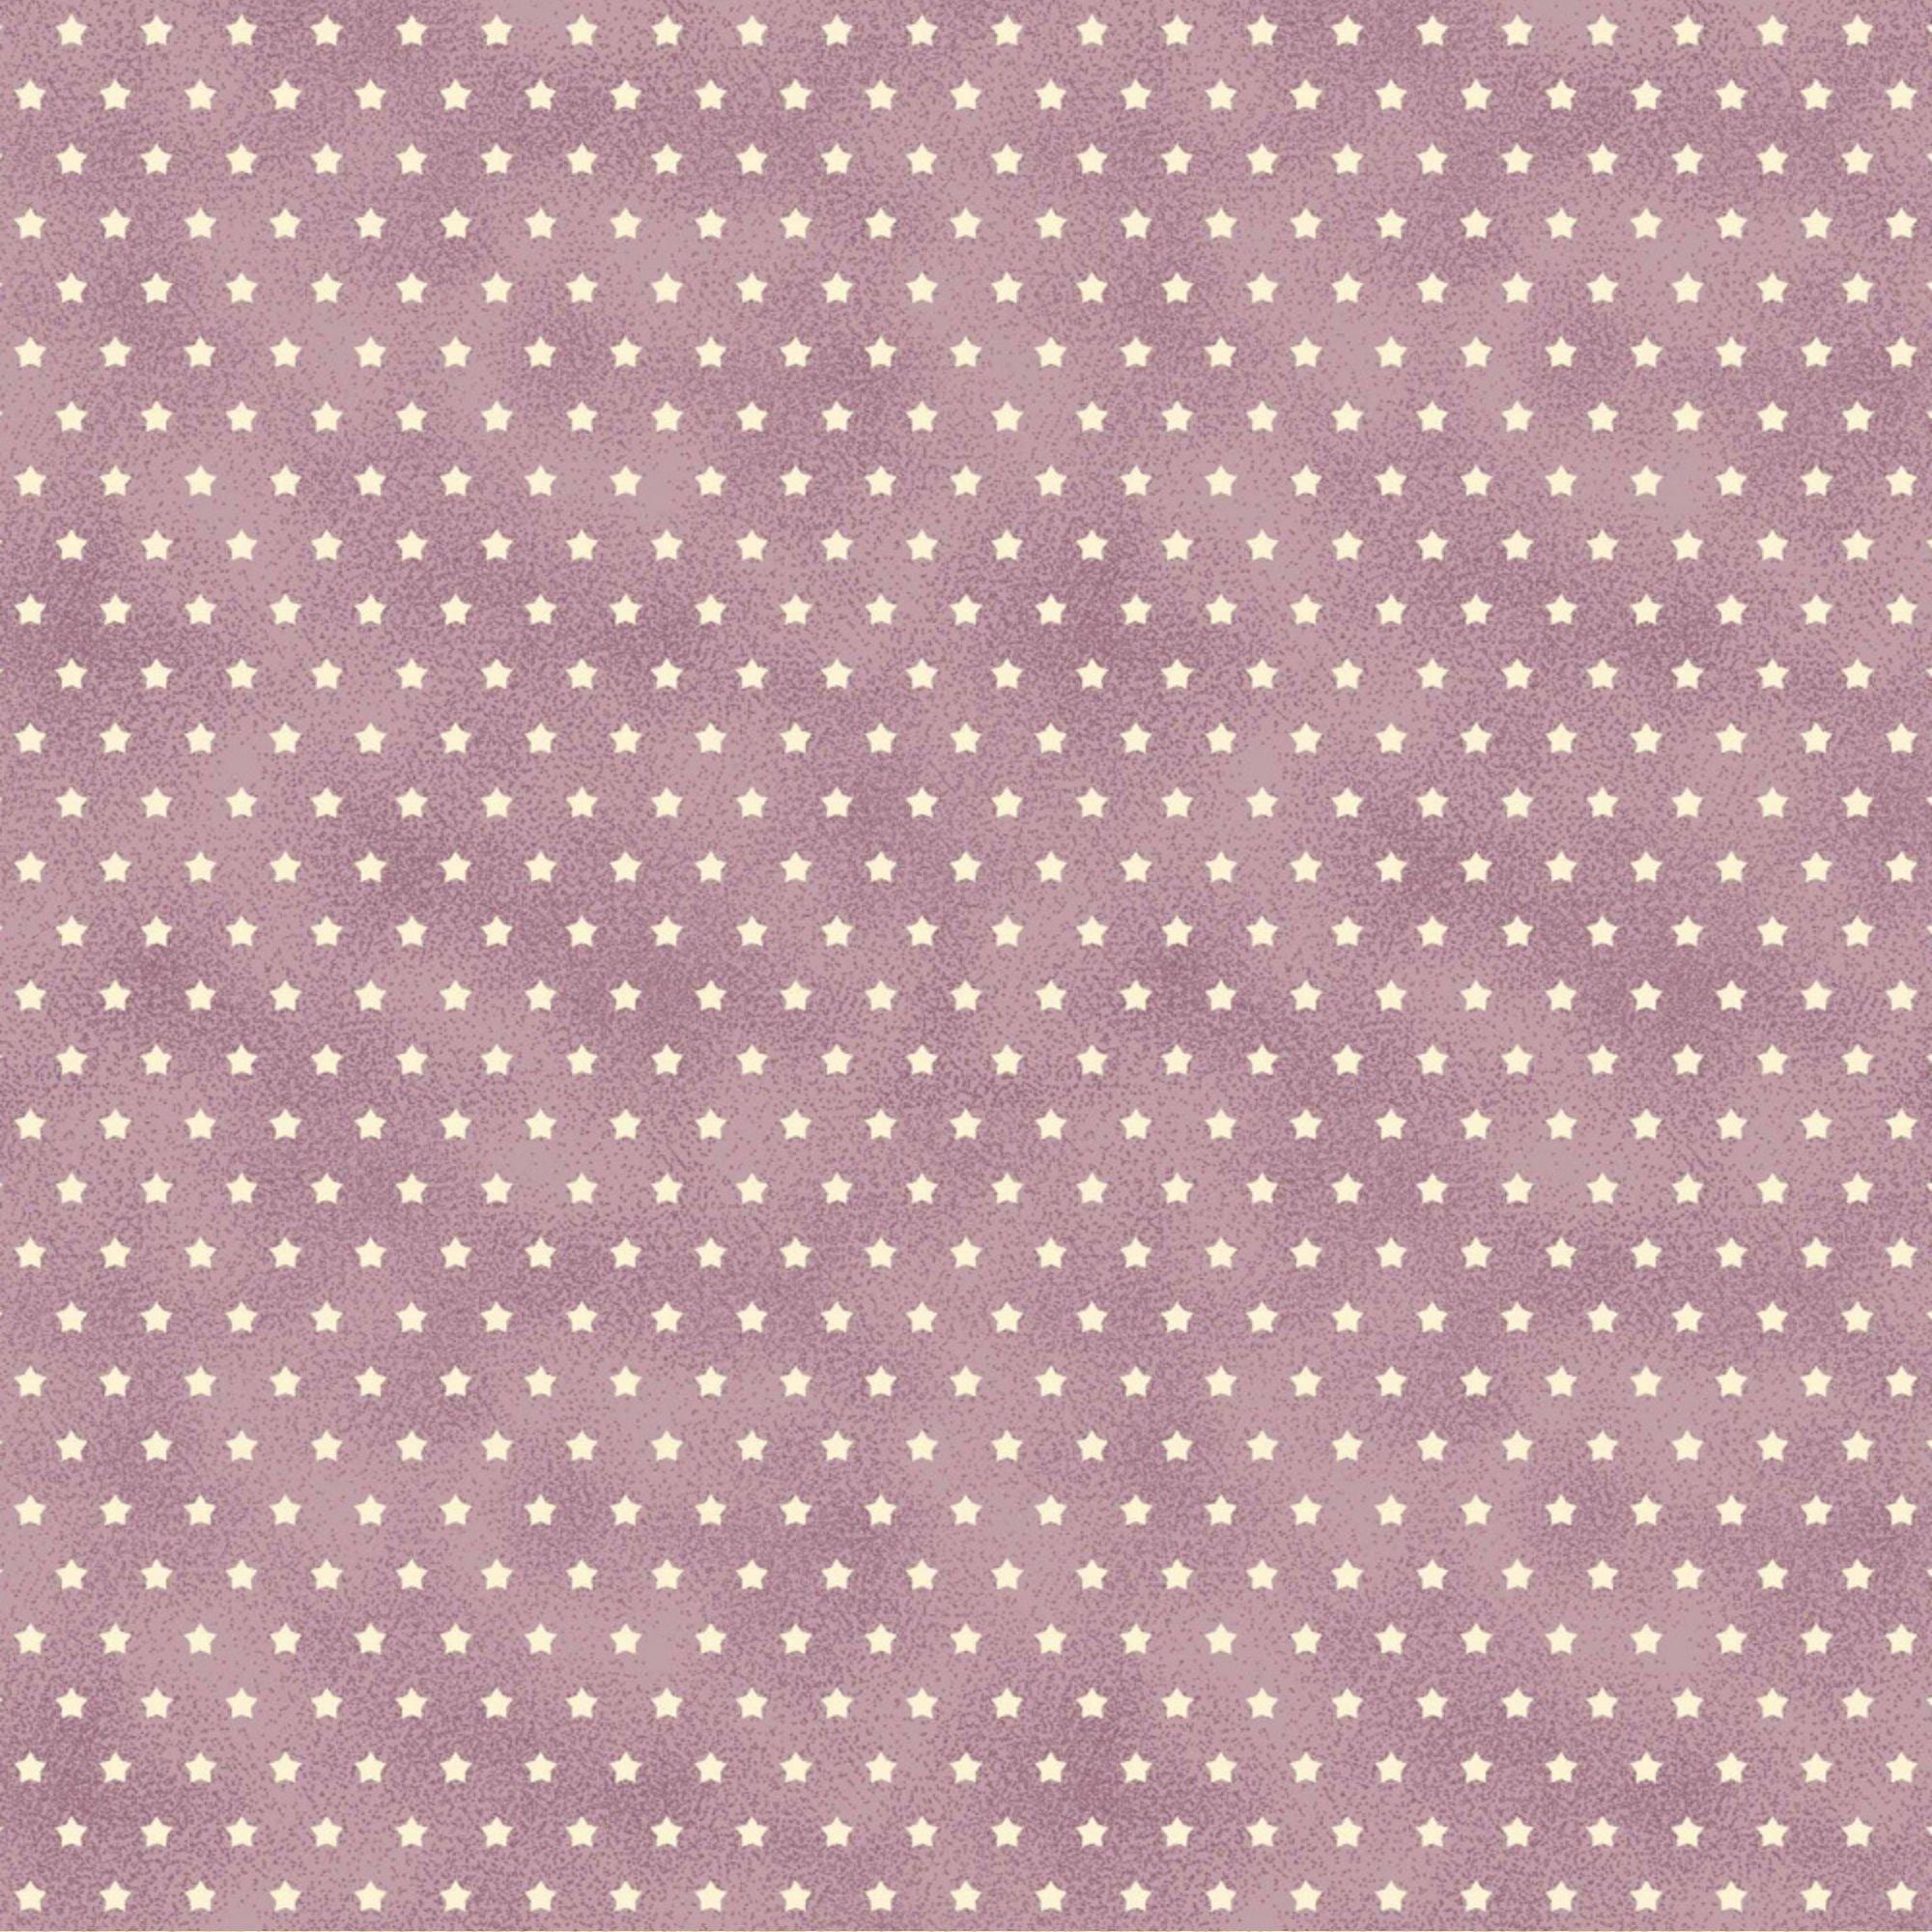 Tecido Tricoline Mini Estrelas - Fundo Poeira Lavanda - Preço de 50cm x 150cm